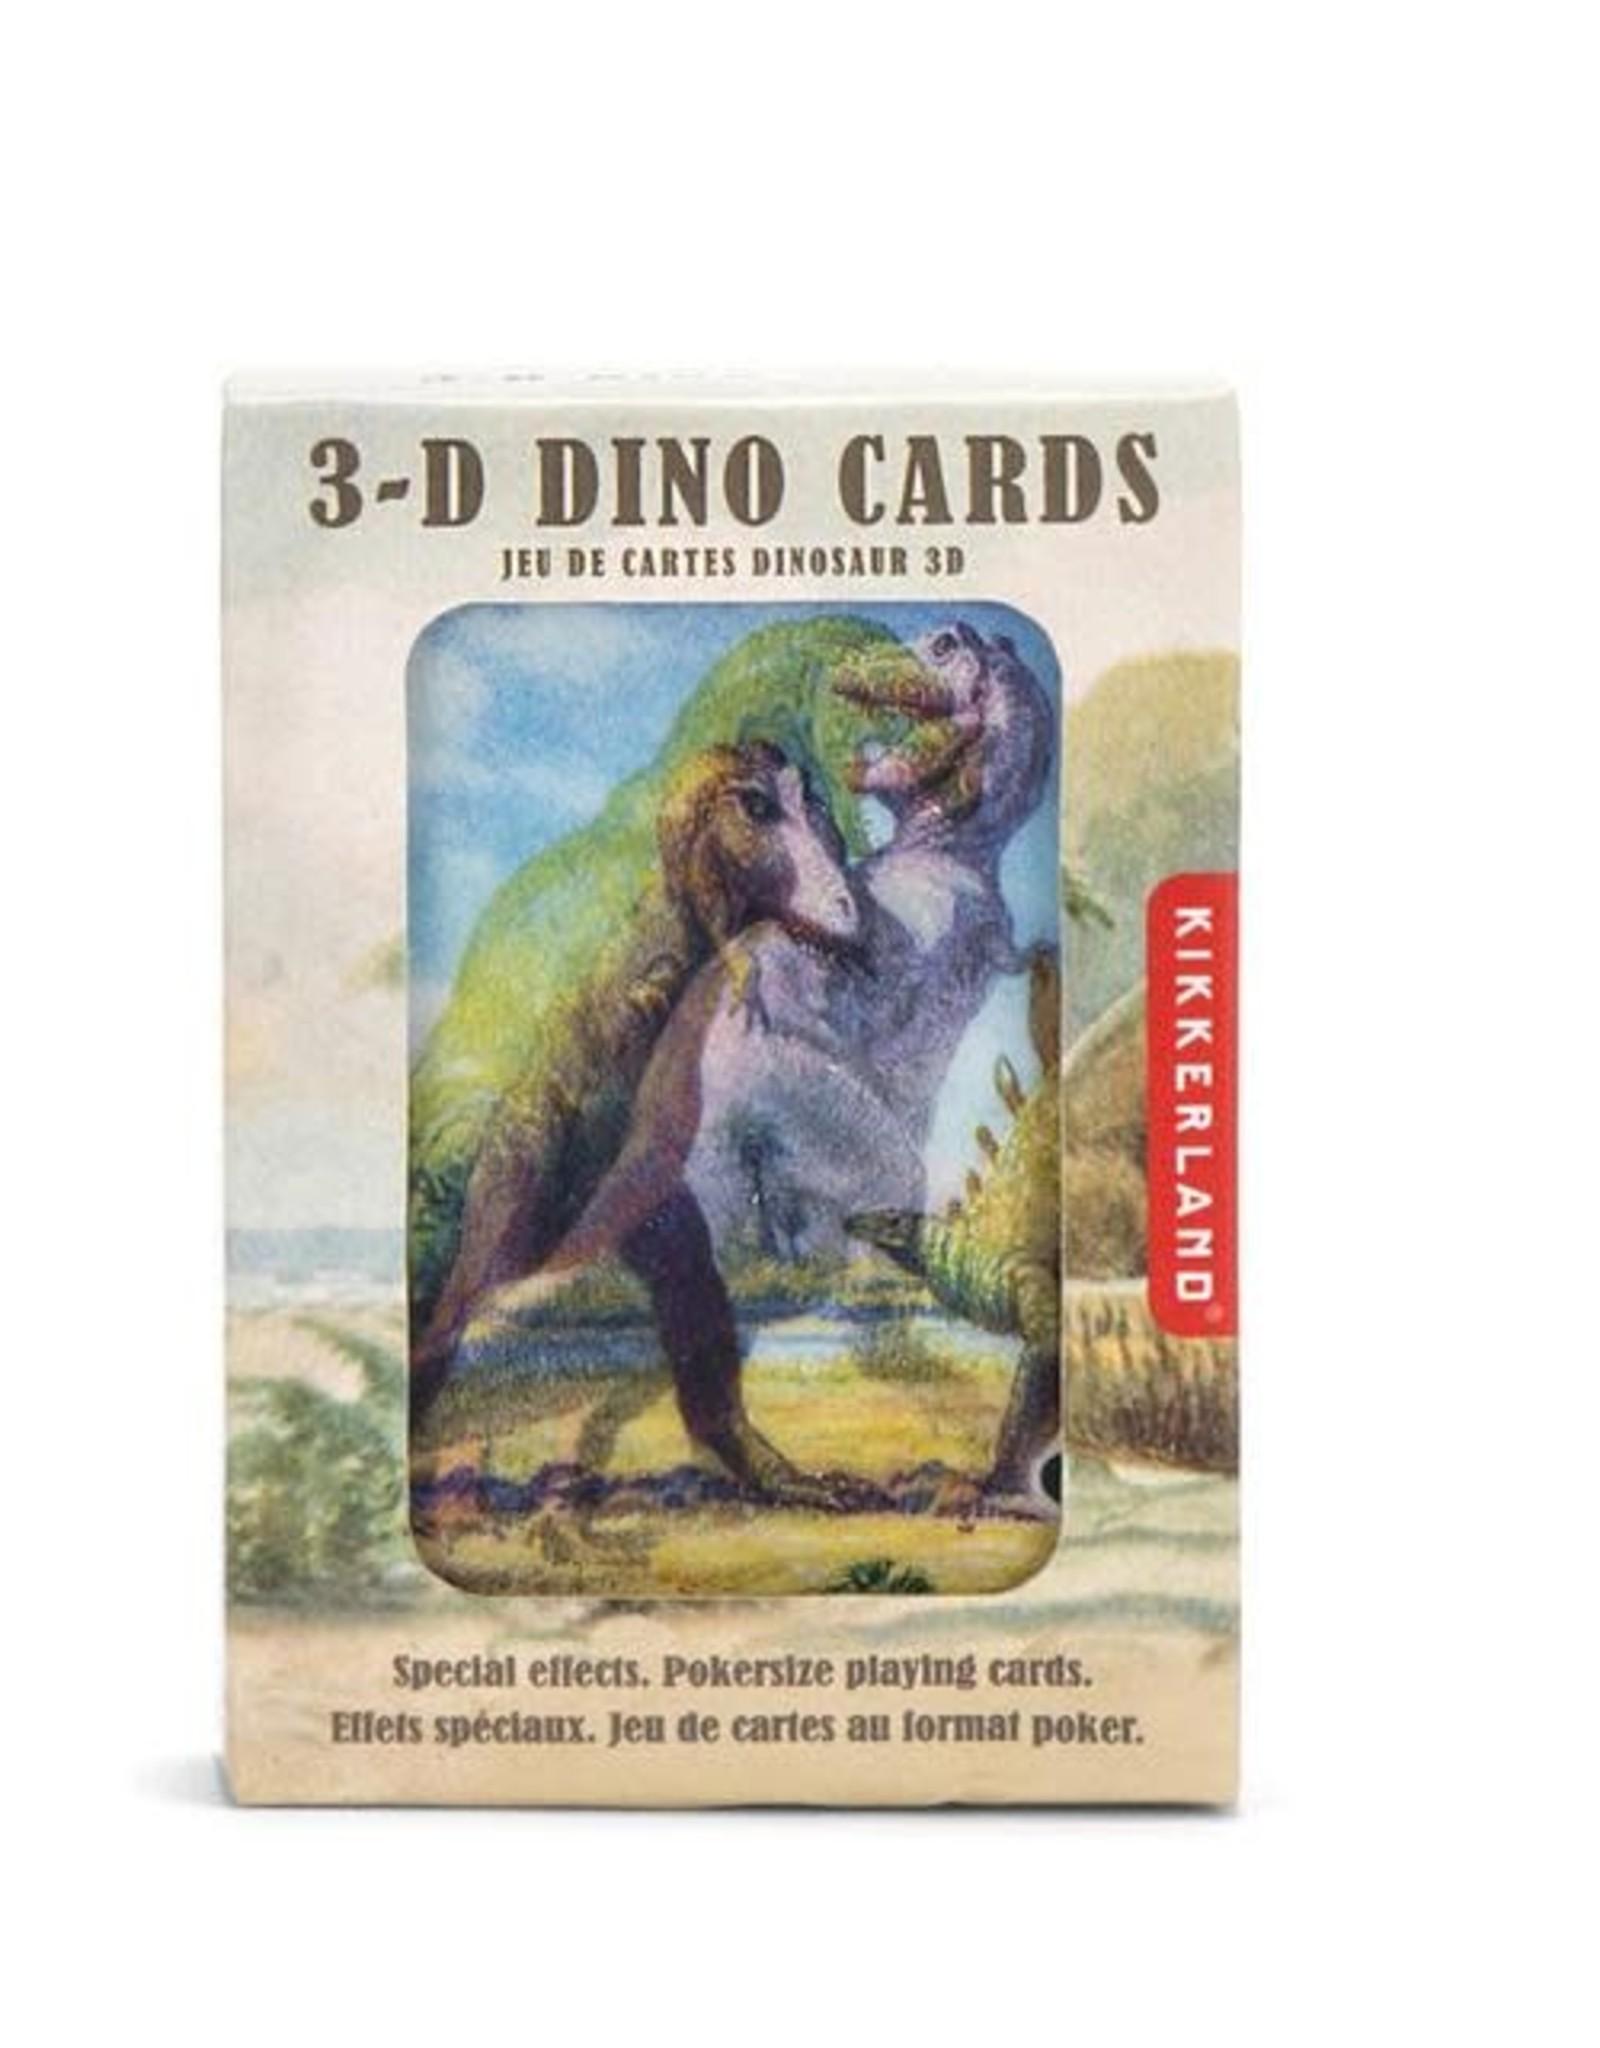 Kikkerland 3D Playing Cards Dinosaur